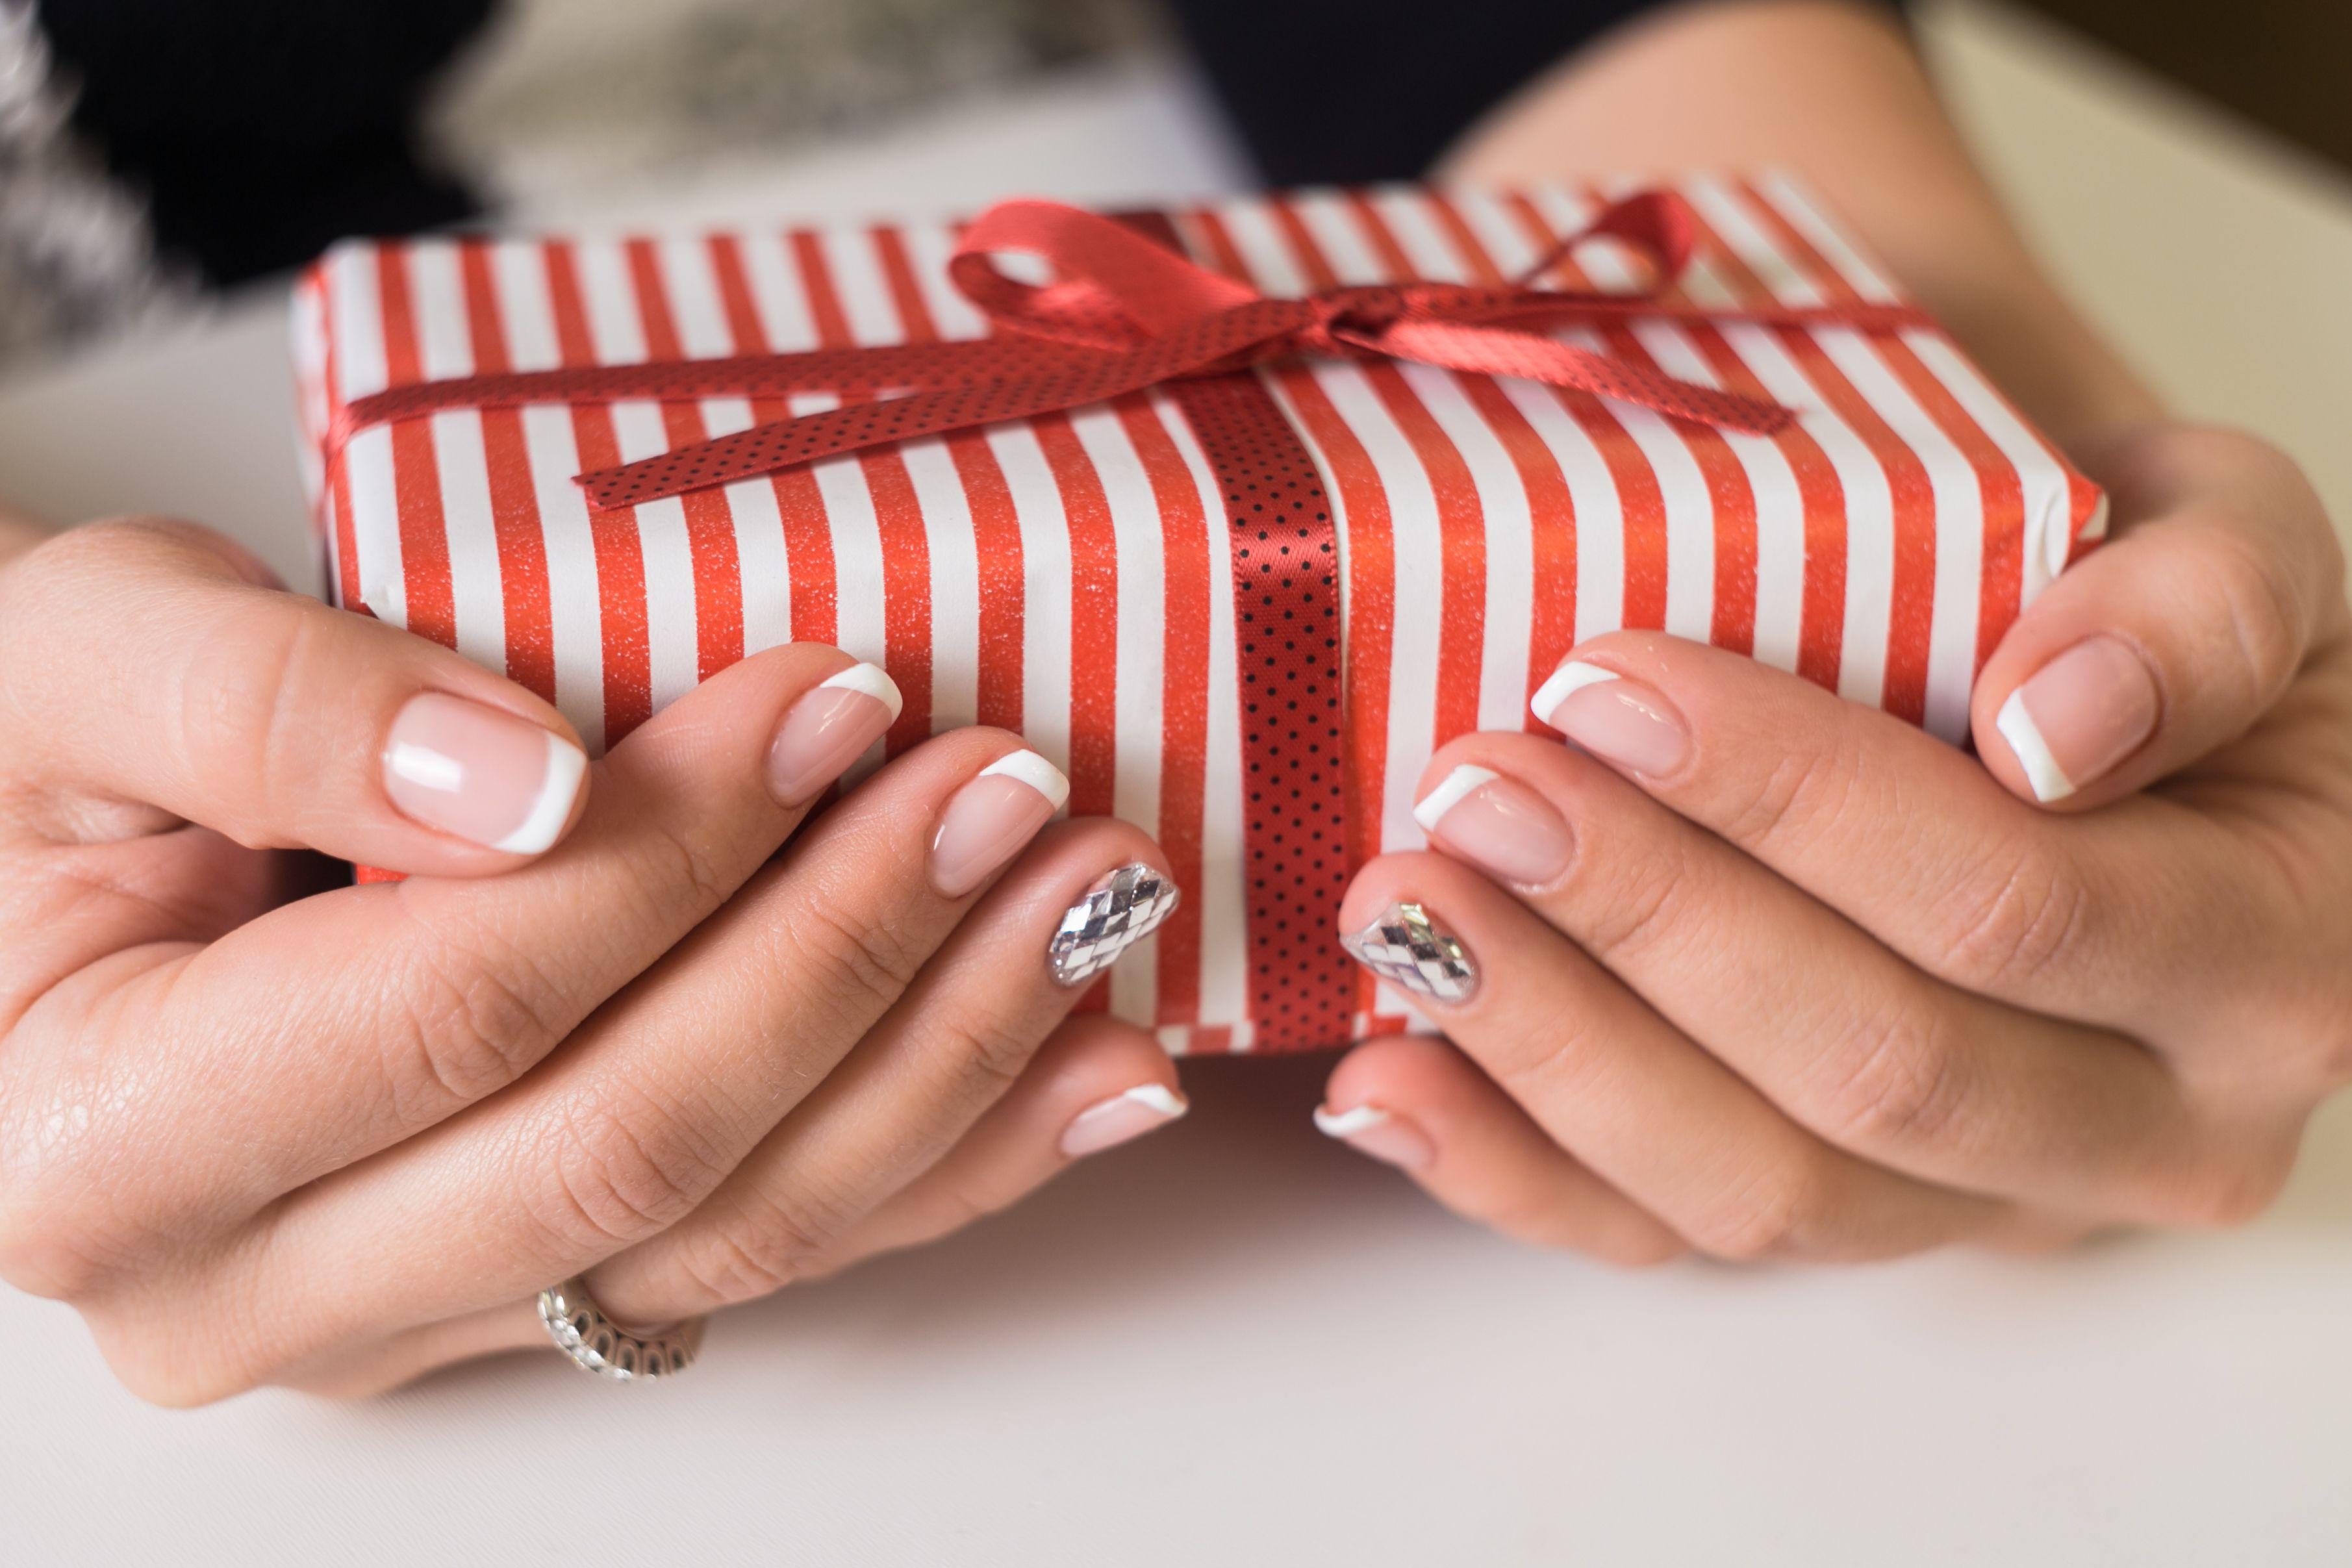 76 Easy Christmas Nail Designs - Cute Nail Art Ideas for a Christmas ...